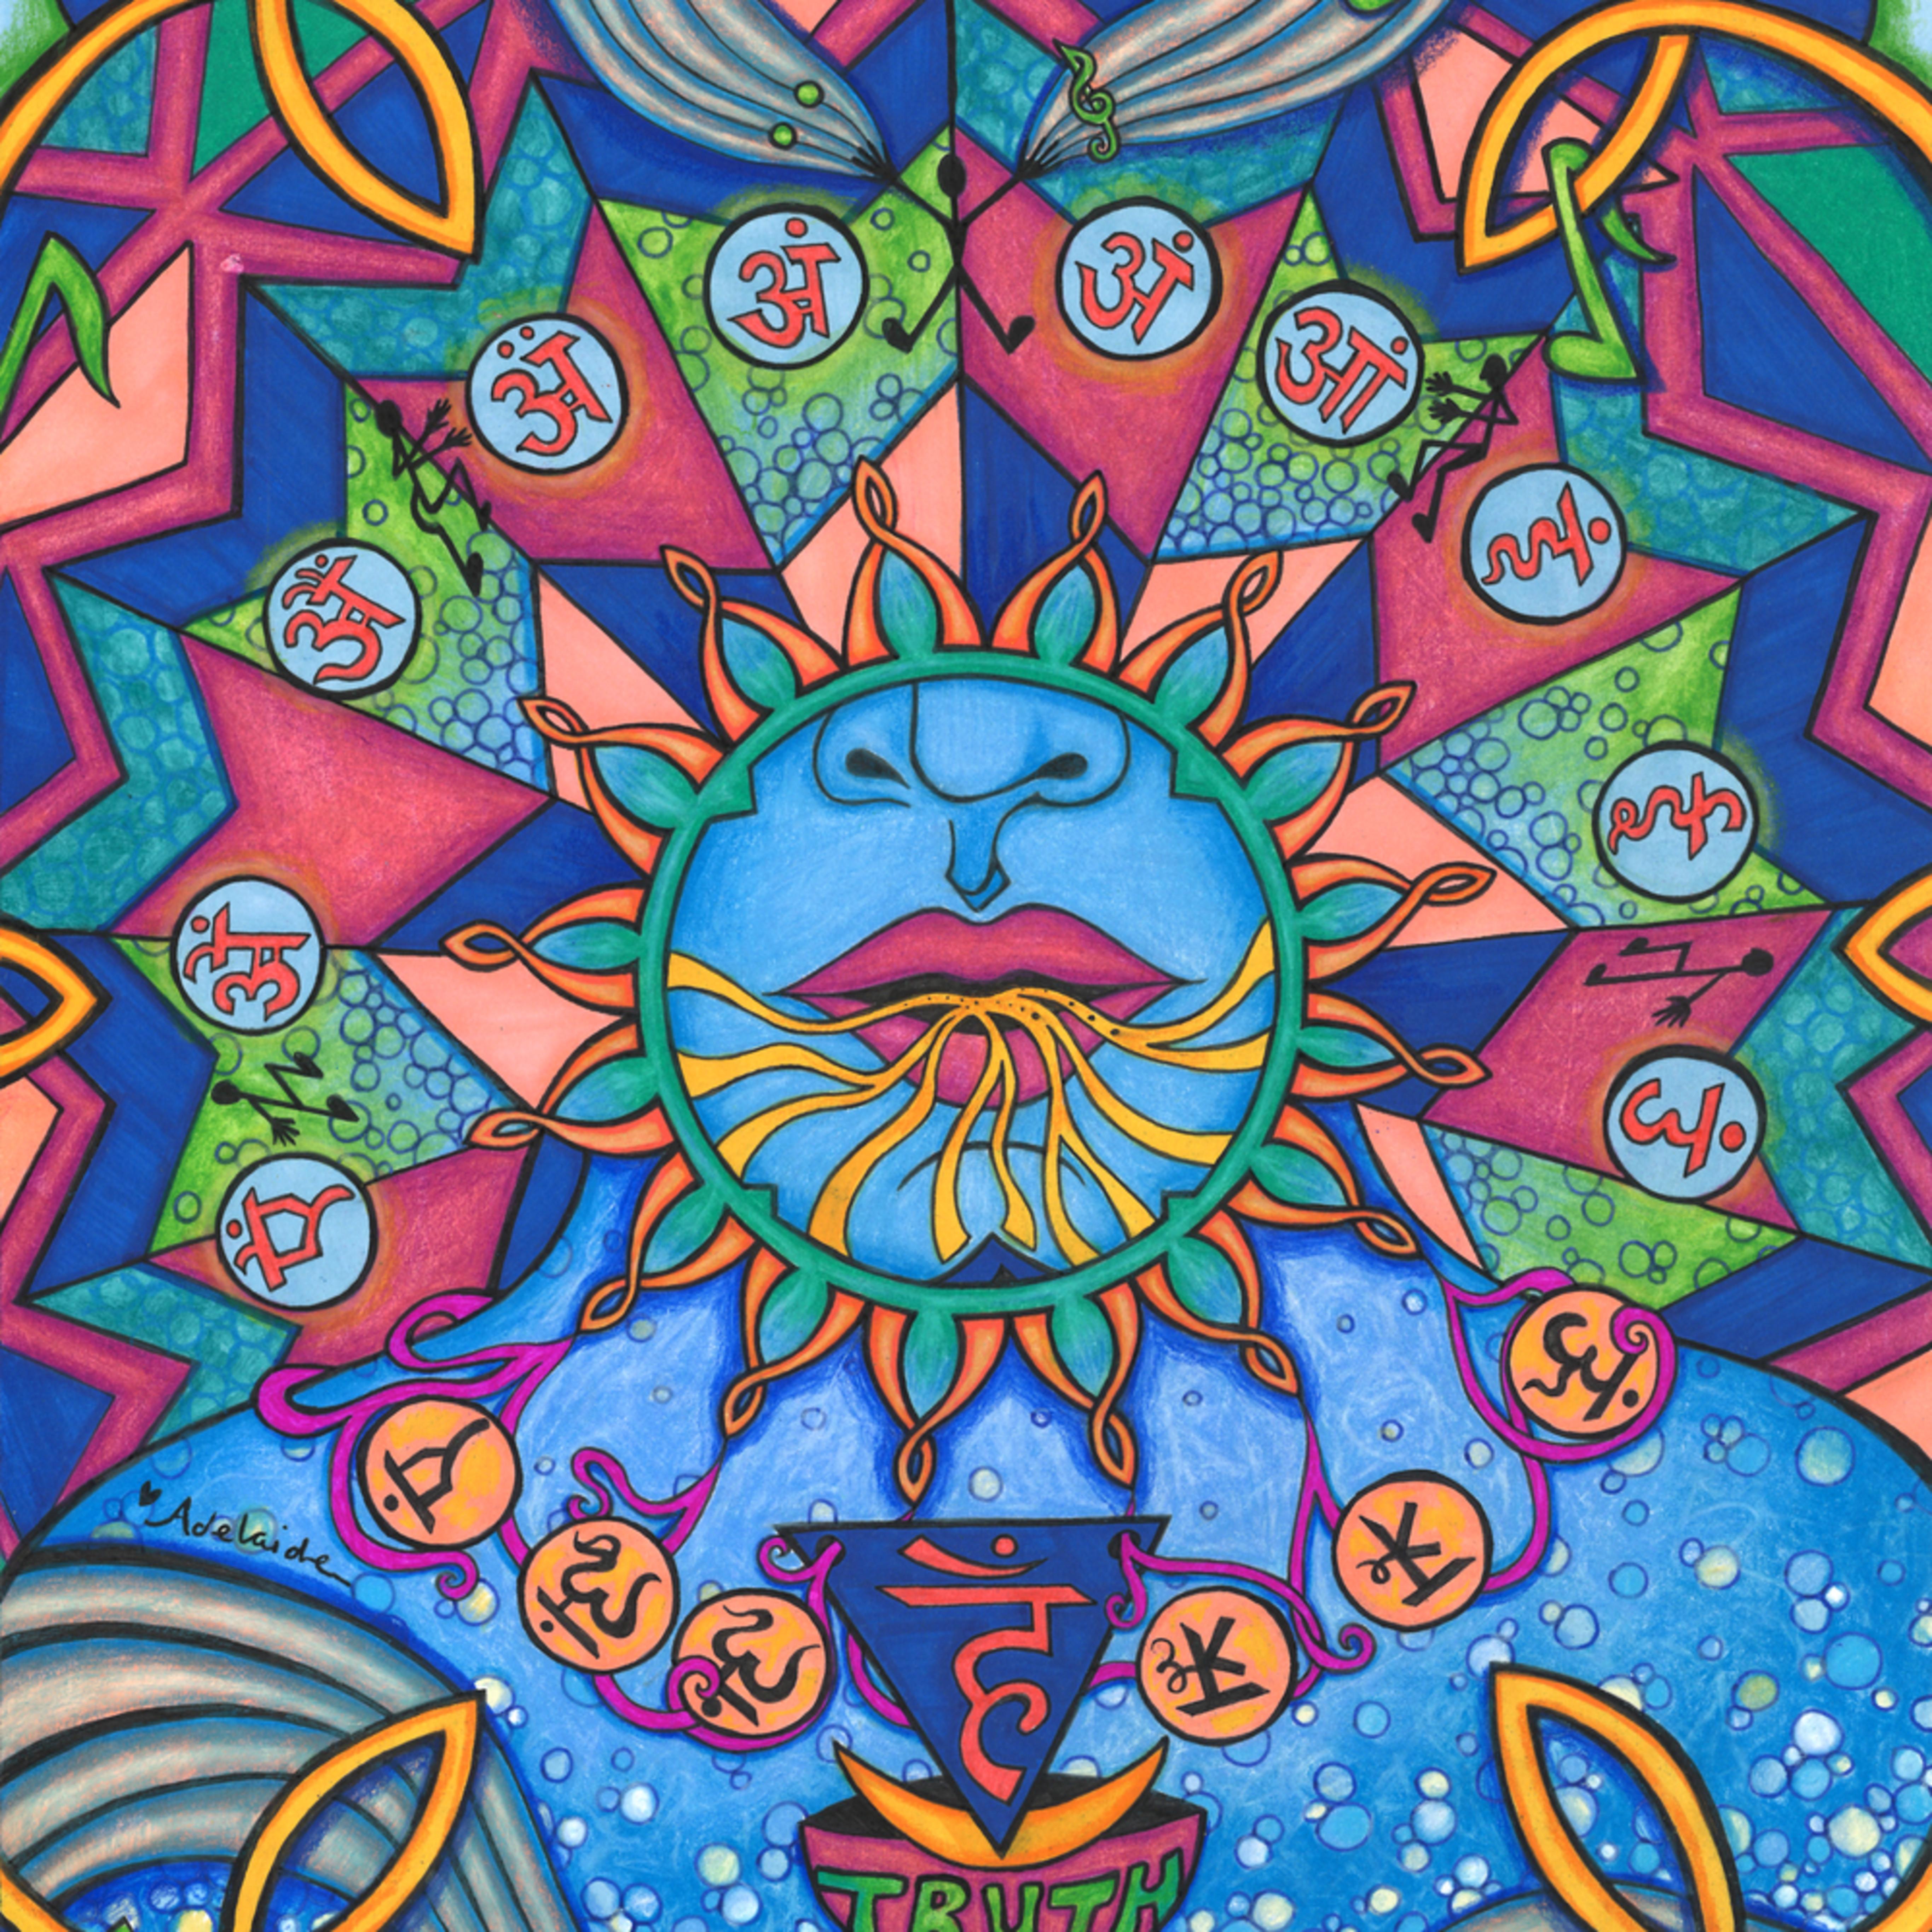 Throat chakra with color ujuwjz